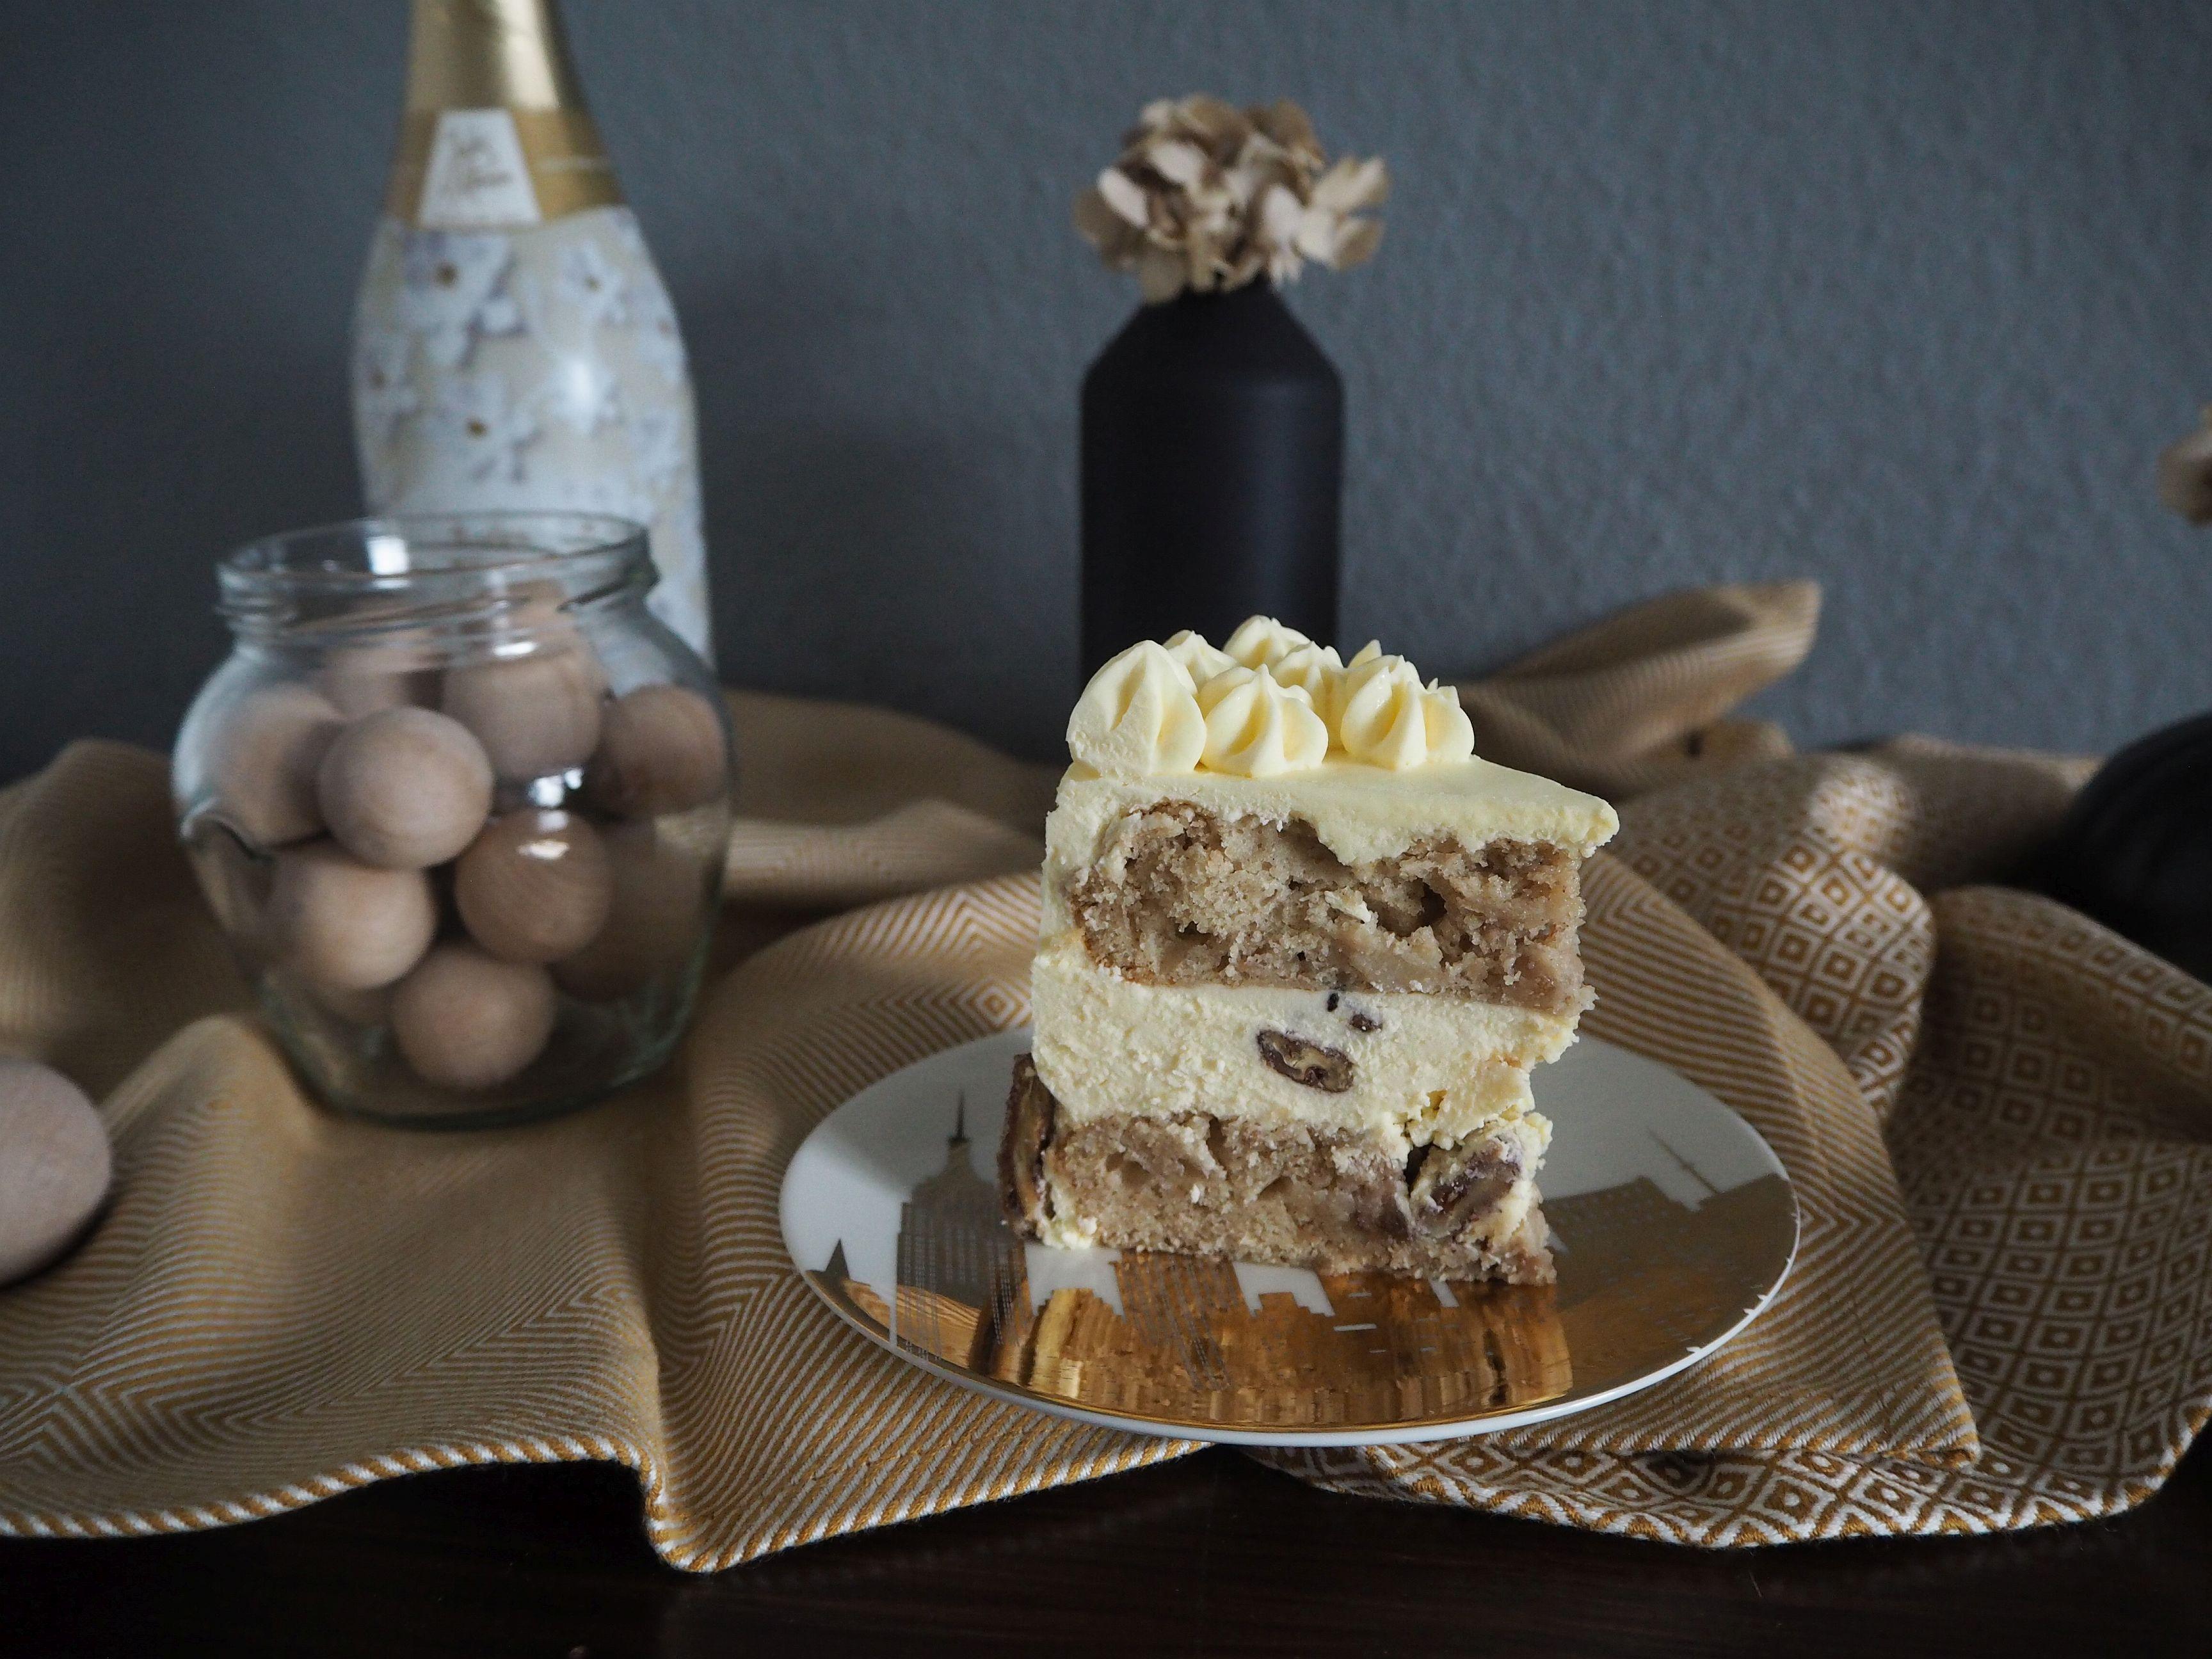 2017-12-skoen-och-kreativ-adventskalender-cookie-and-cake-love-birnen-pekannuss-cake (10)